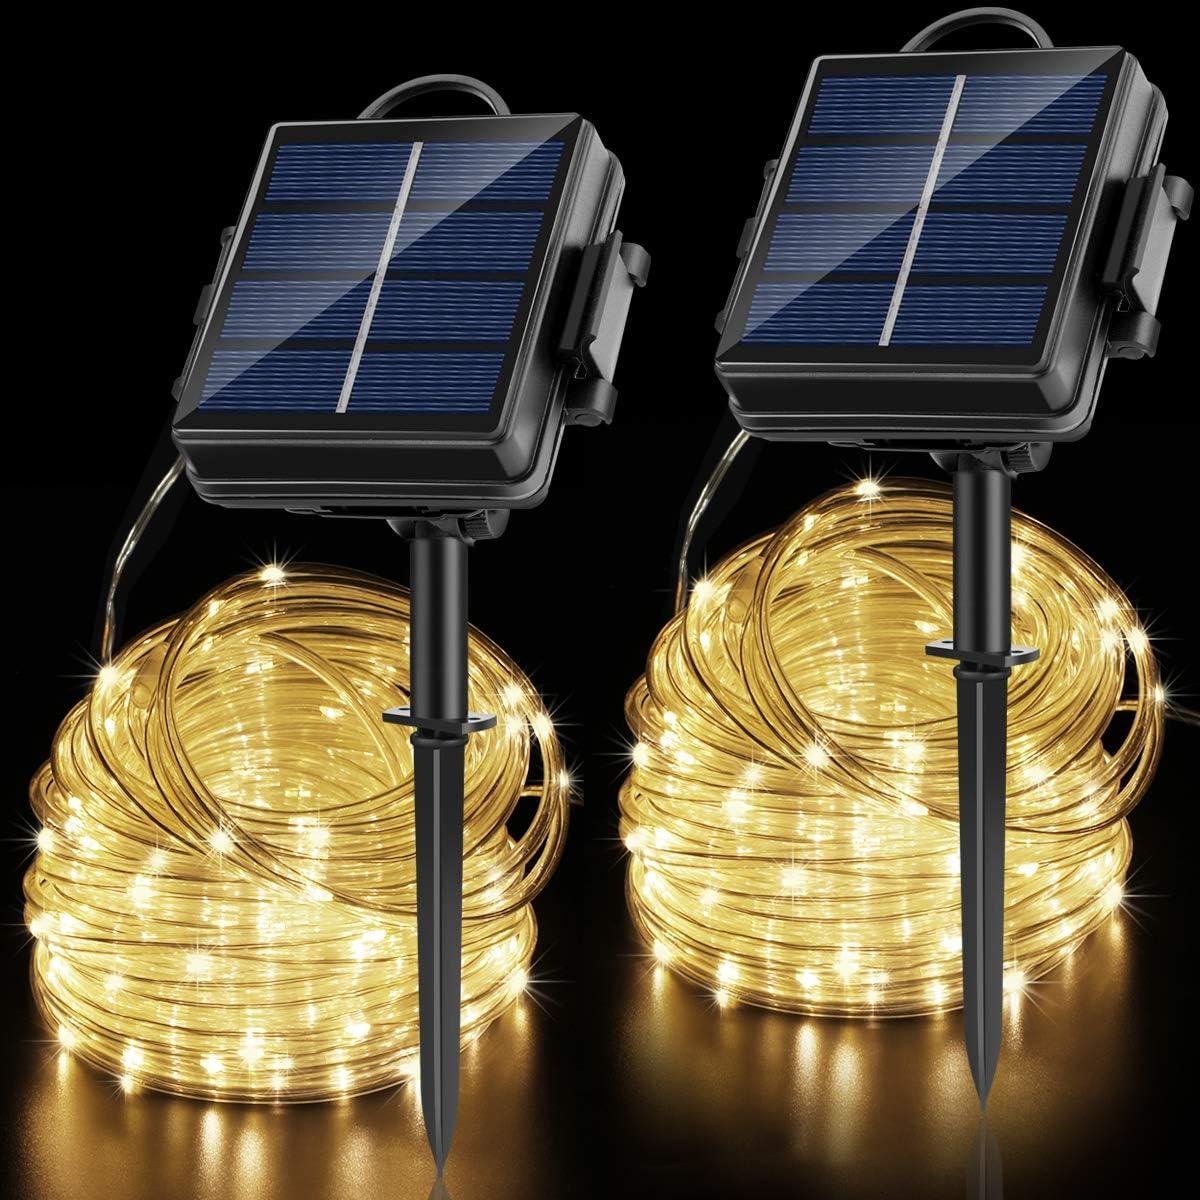 OPOLEMIN Solar String Lights Outdoor, 2 Packs 200 LED 65.6ft Solar Rope Lights Solar 2400 mAh Rechargeable Battery Powered 8 Modes PVC Tube Waterproof Solar Fairy Lights for Halloween Garden Decor